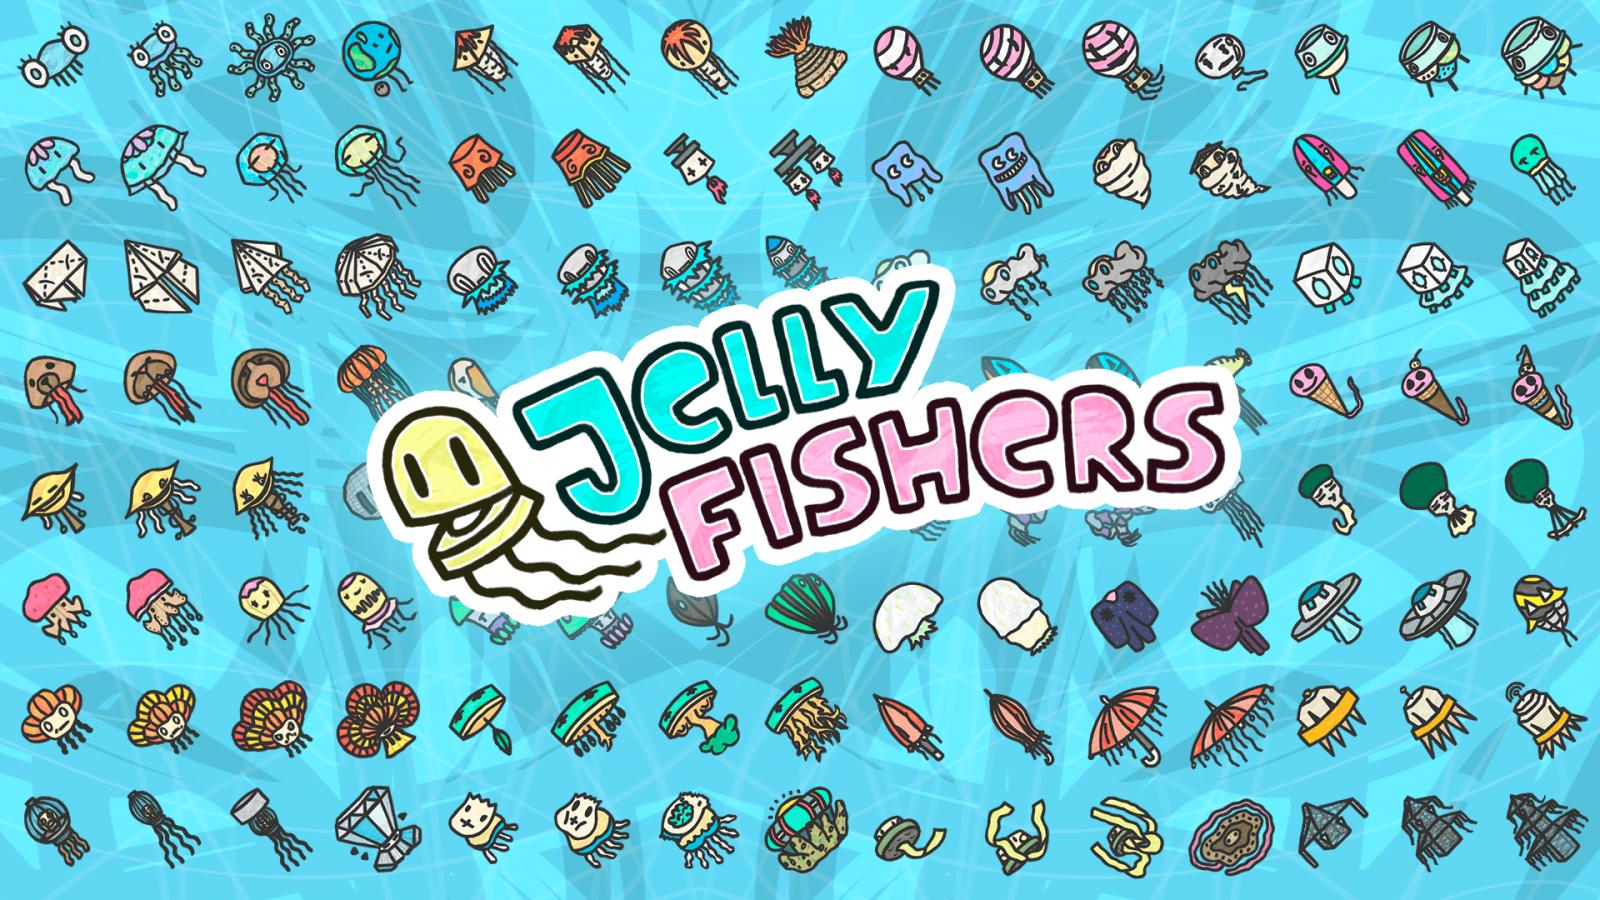 jellyfishers